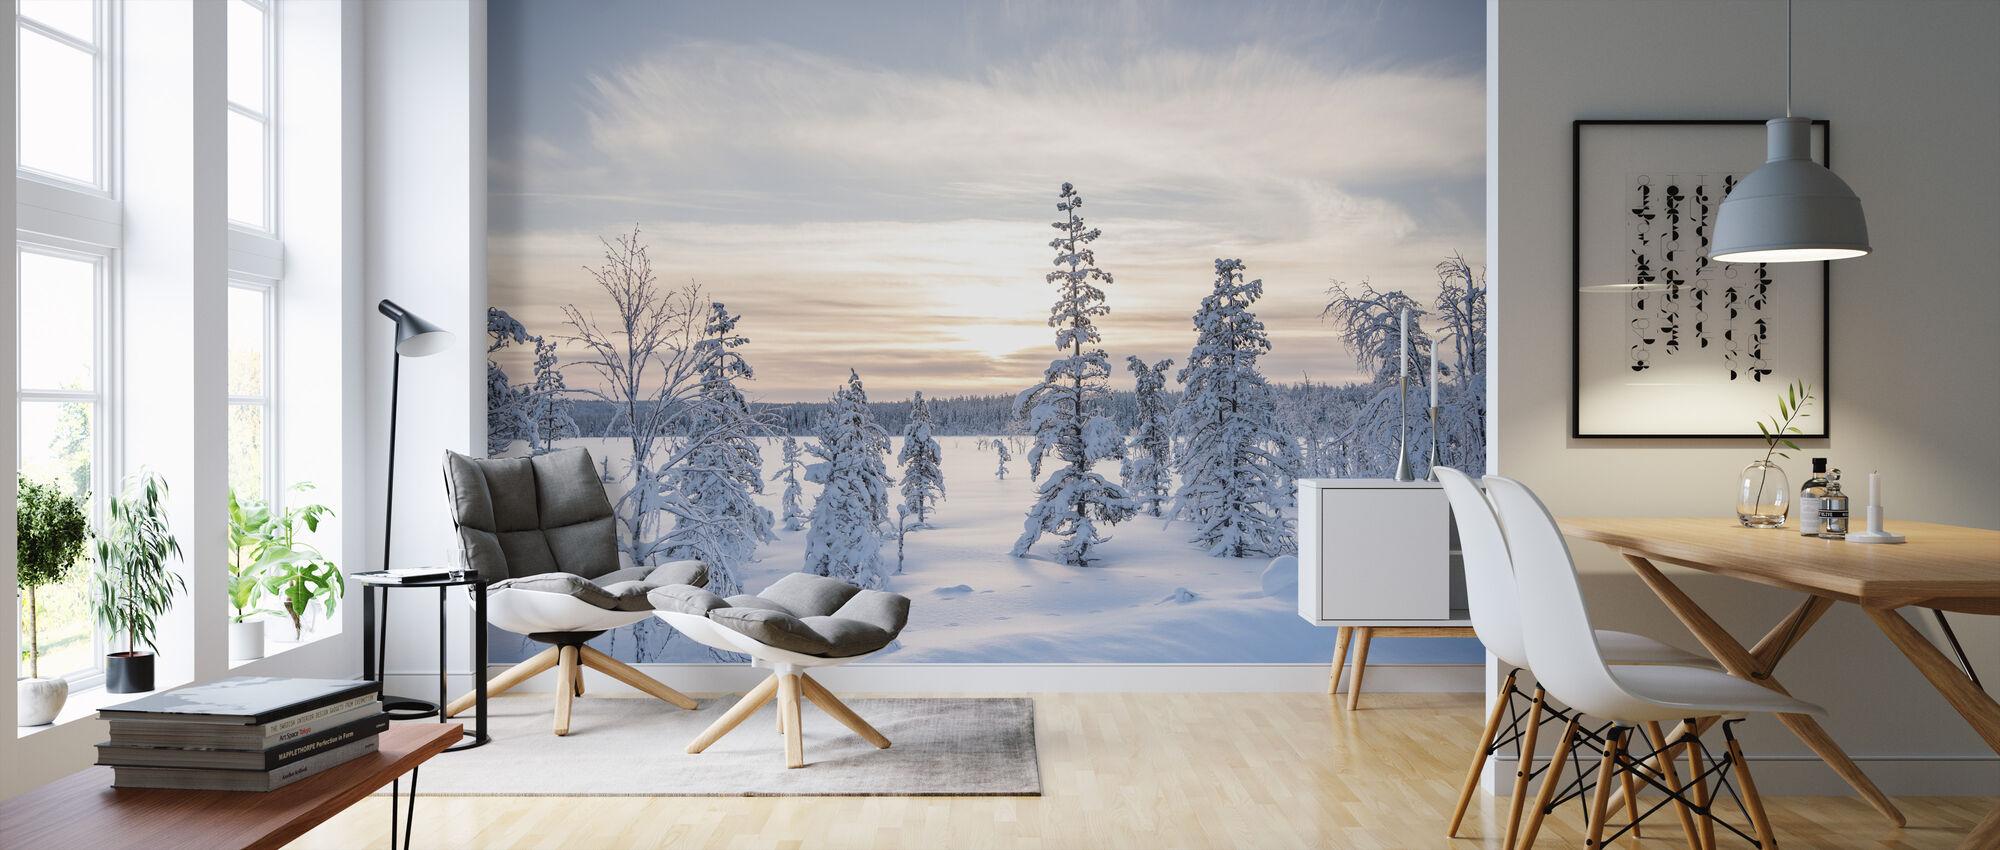 Winter Day - Wallpaper - Living Room